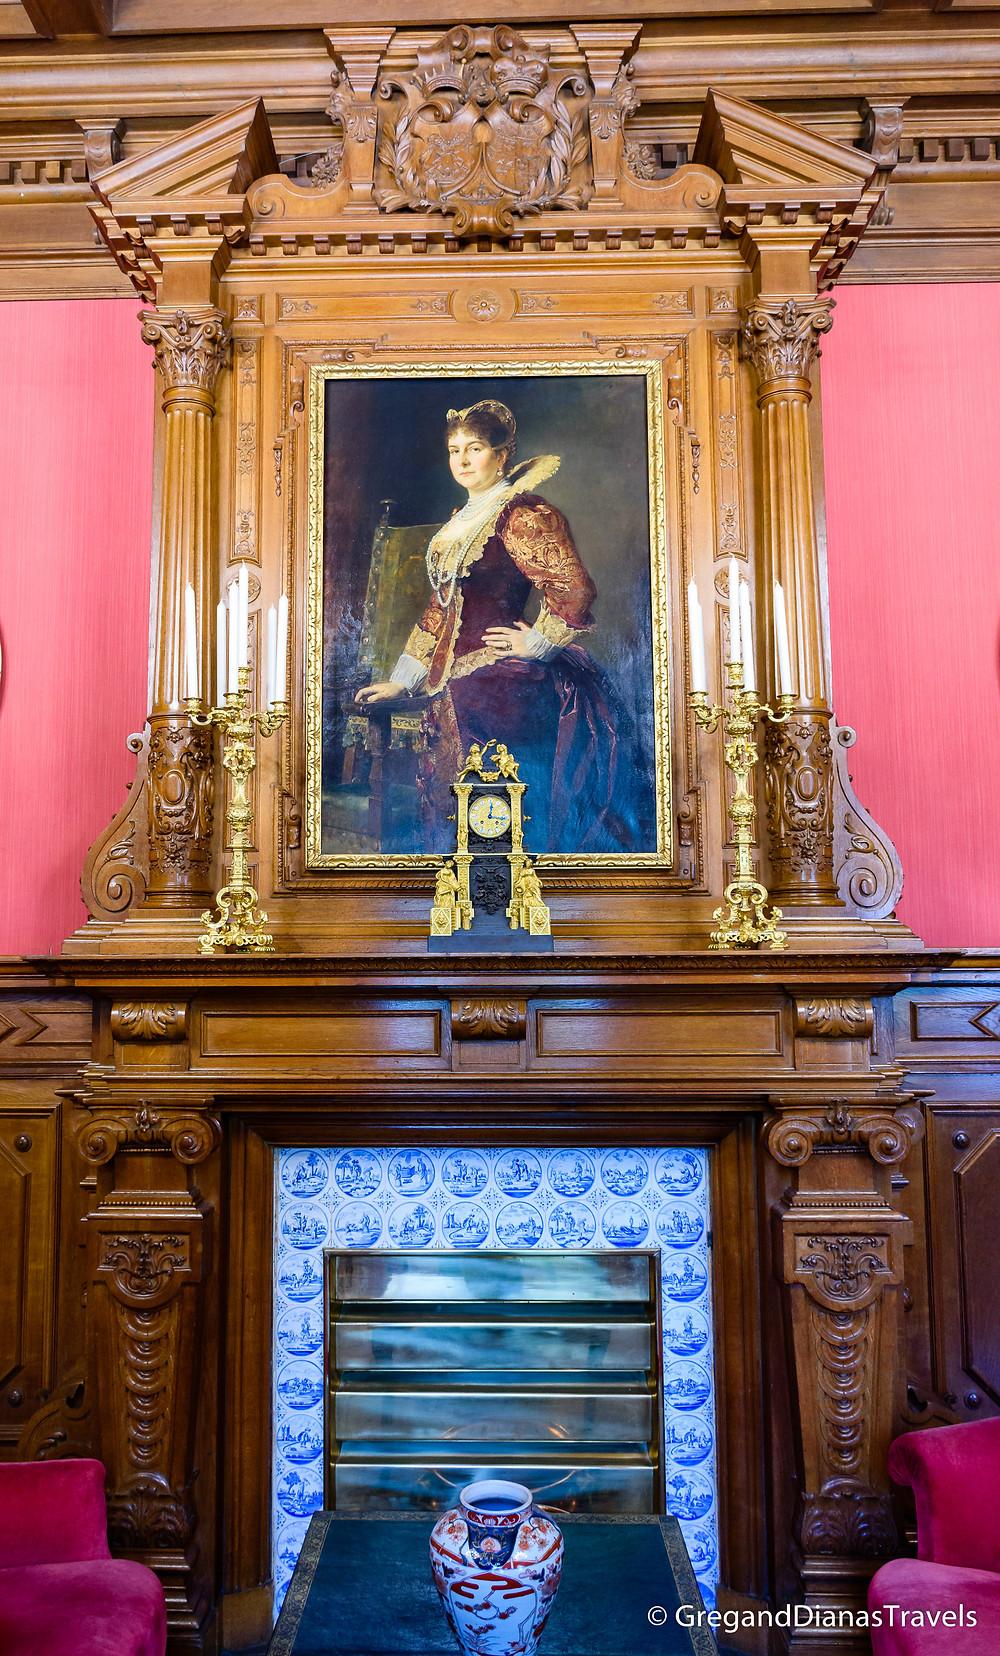 Portrait of Lady Mary Hamilton, Red Salon Festetics Castle, Keszthely Hungary, Travel blog, Travel blogger, Travel photography